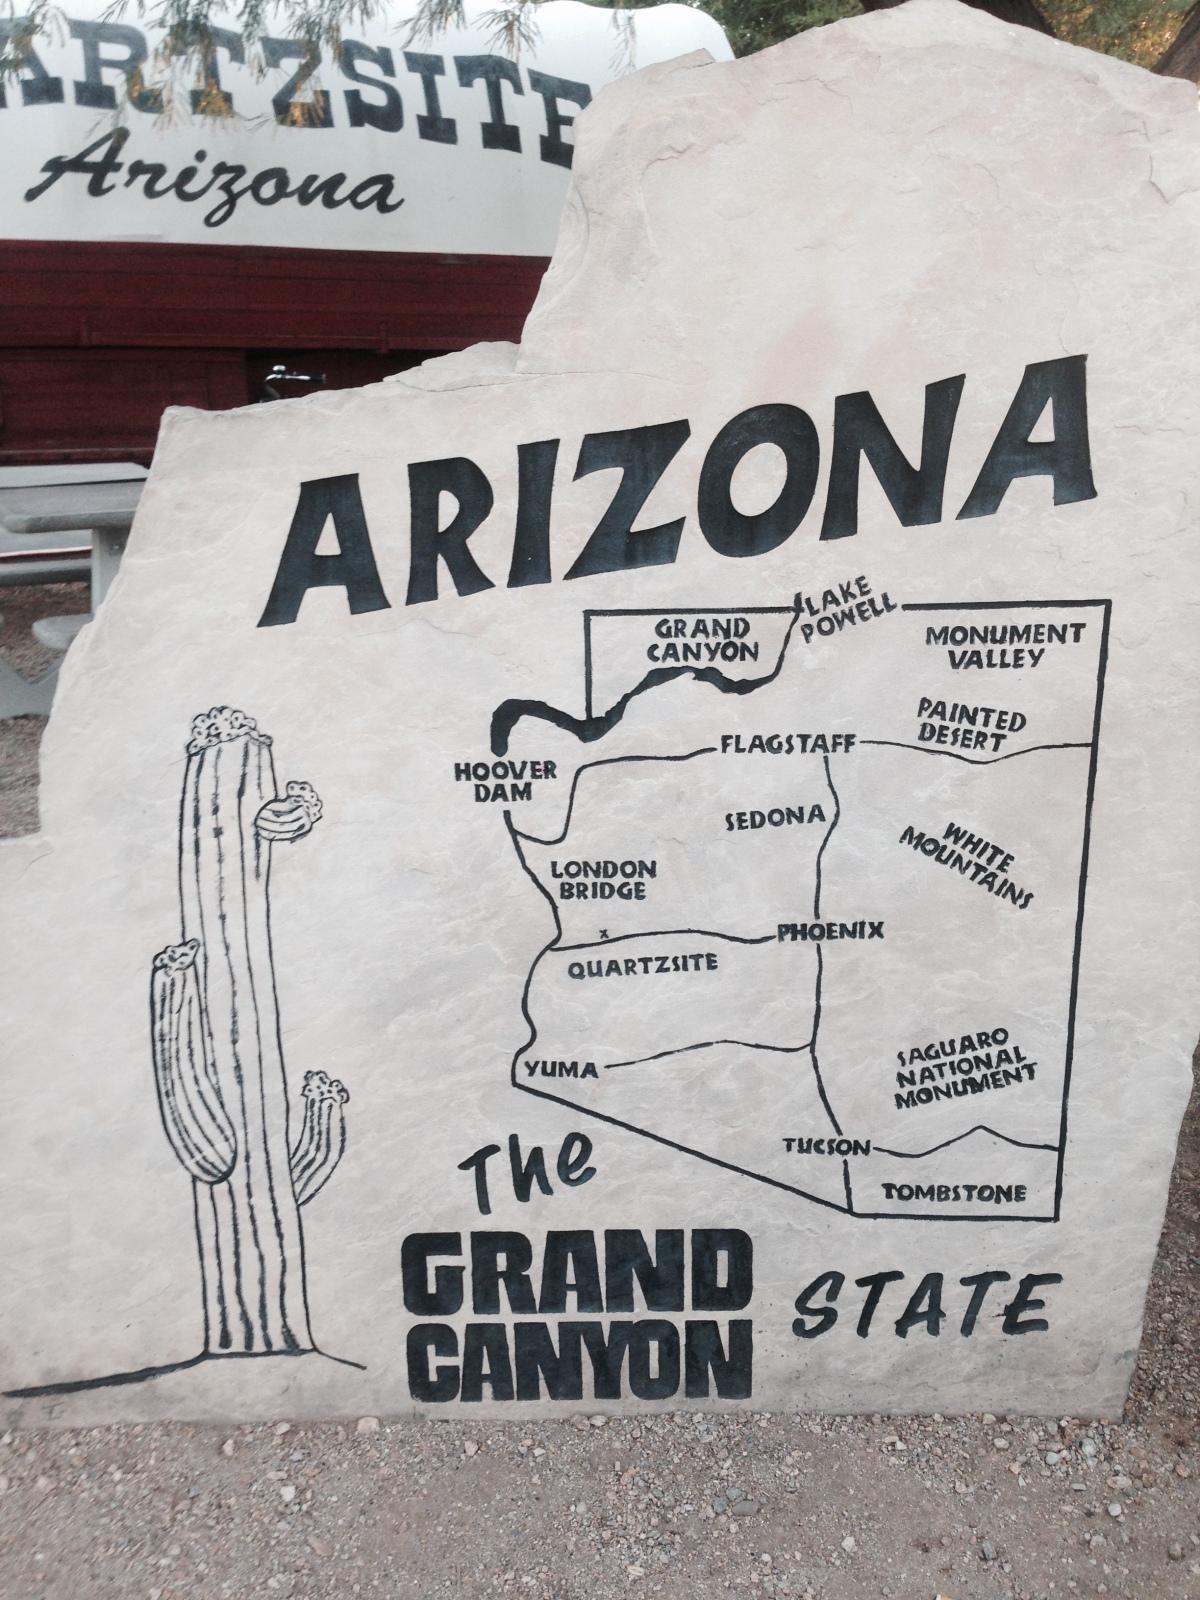 Arizona_marker_ShaikhWelcome